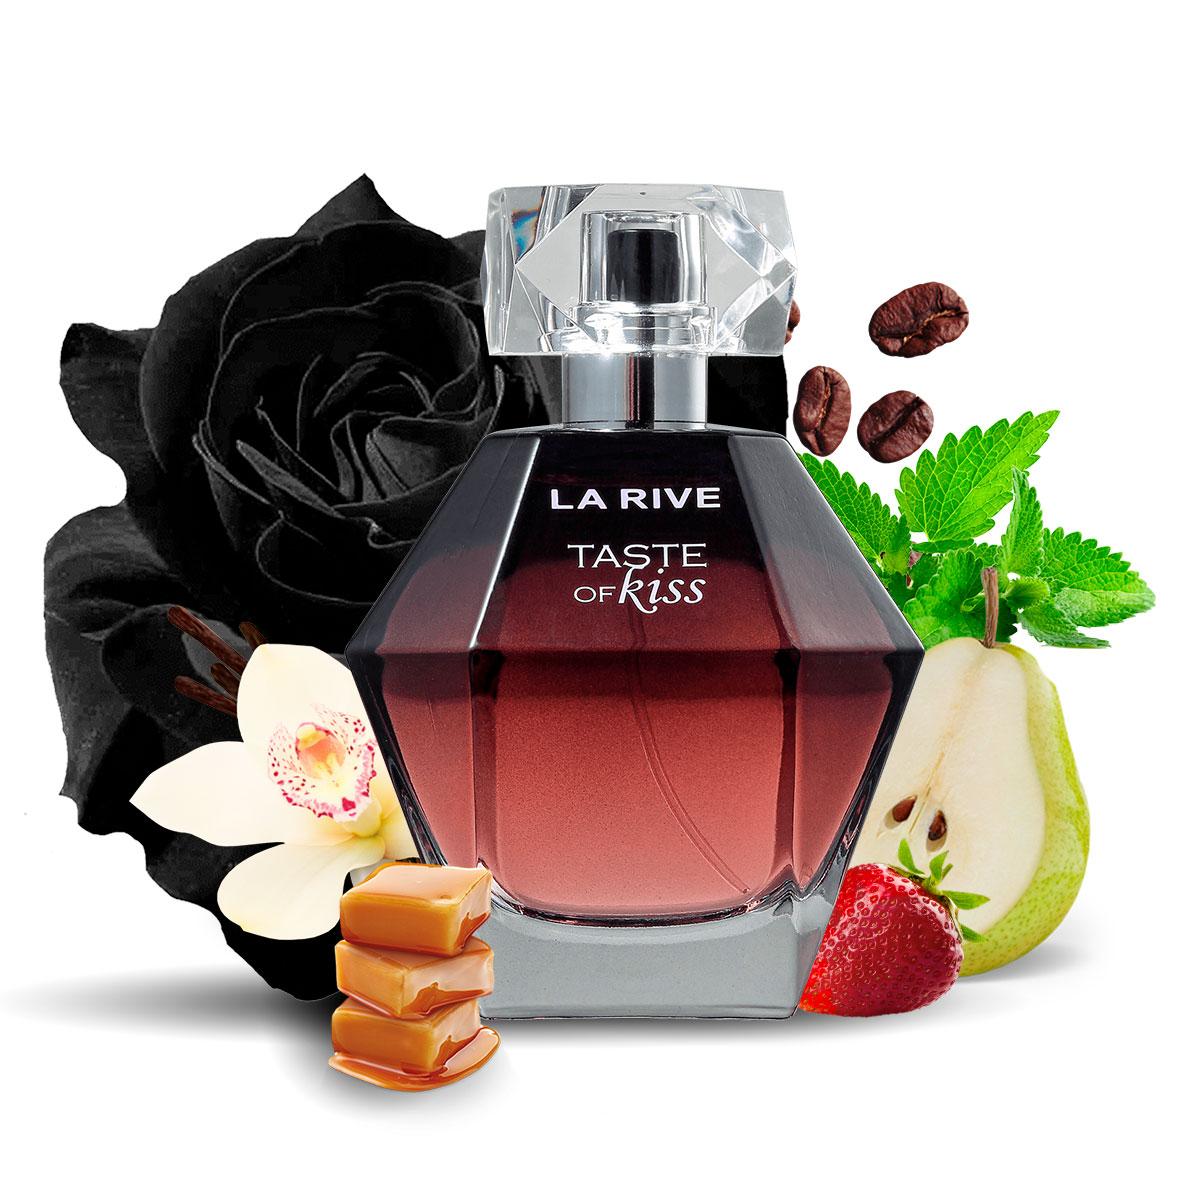 Kit 2 Perfumes Importados Extreme e Taste of Kiss La Rive  - Mercari Perfumes